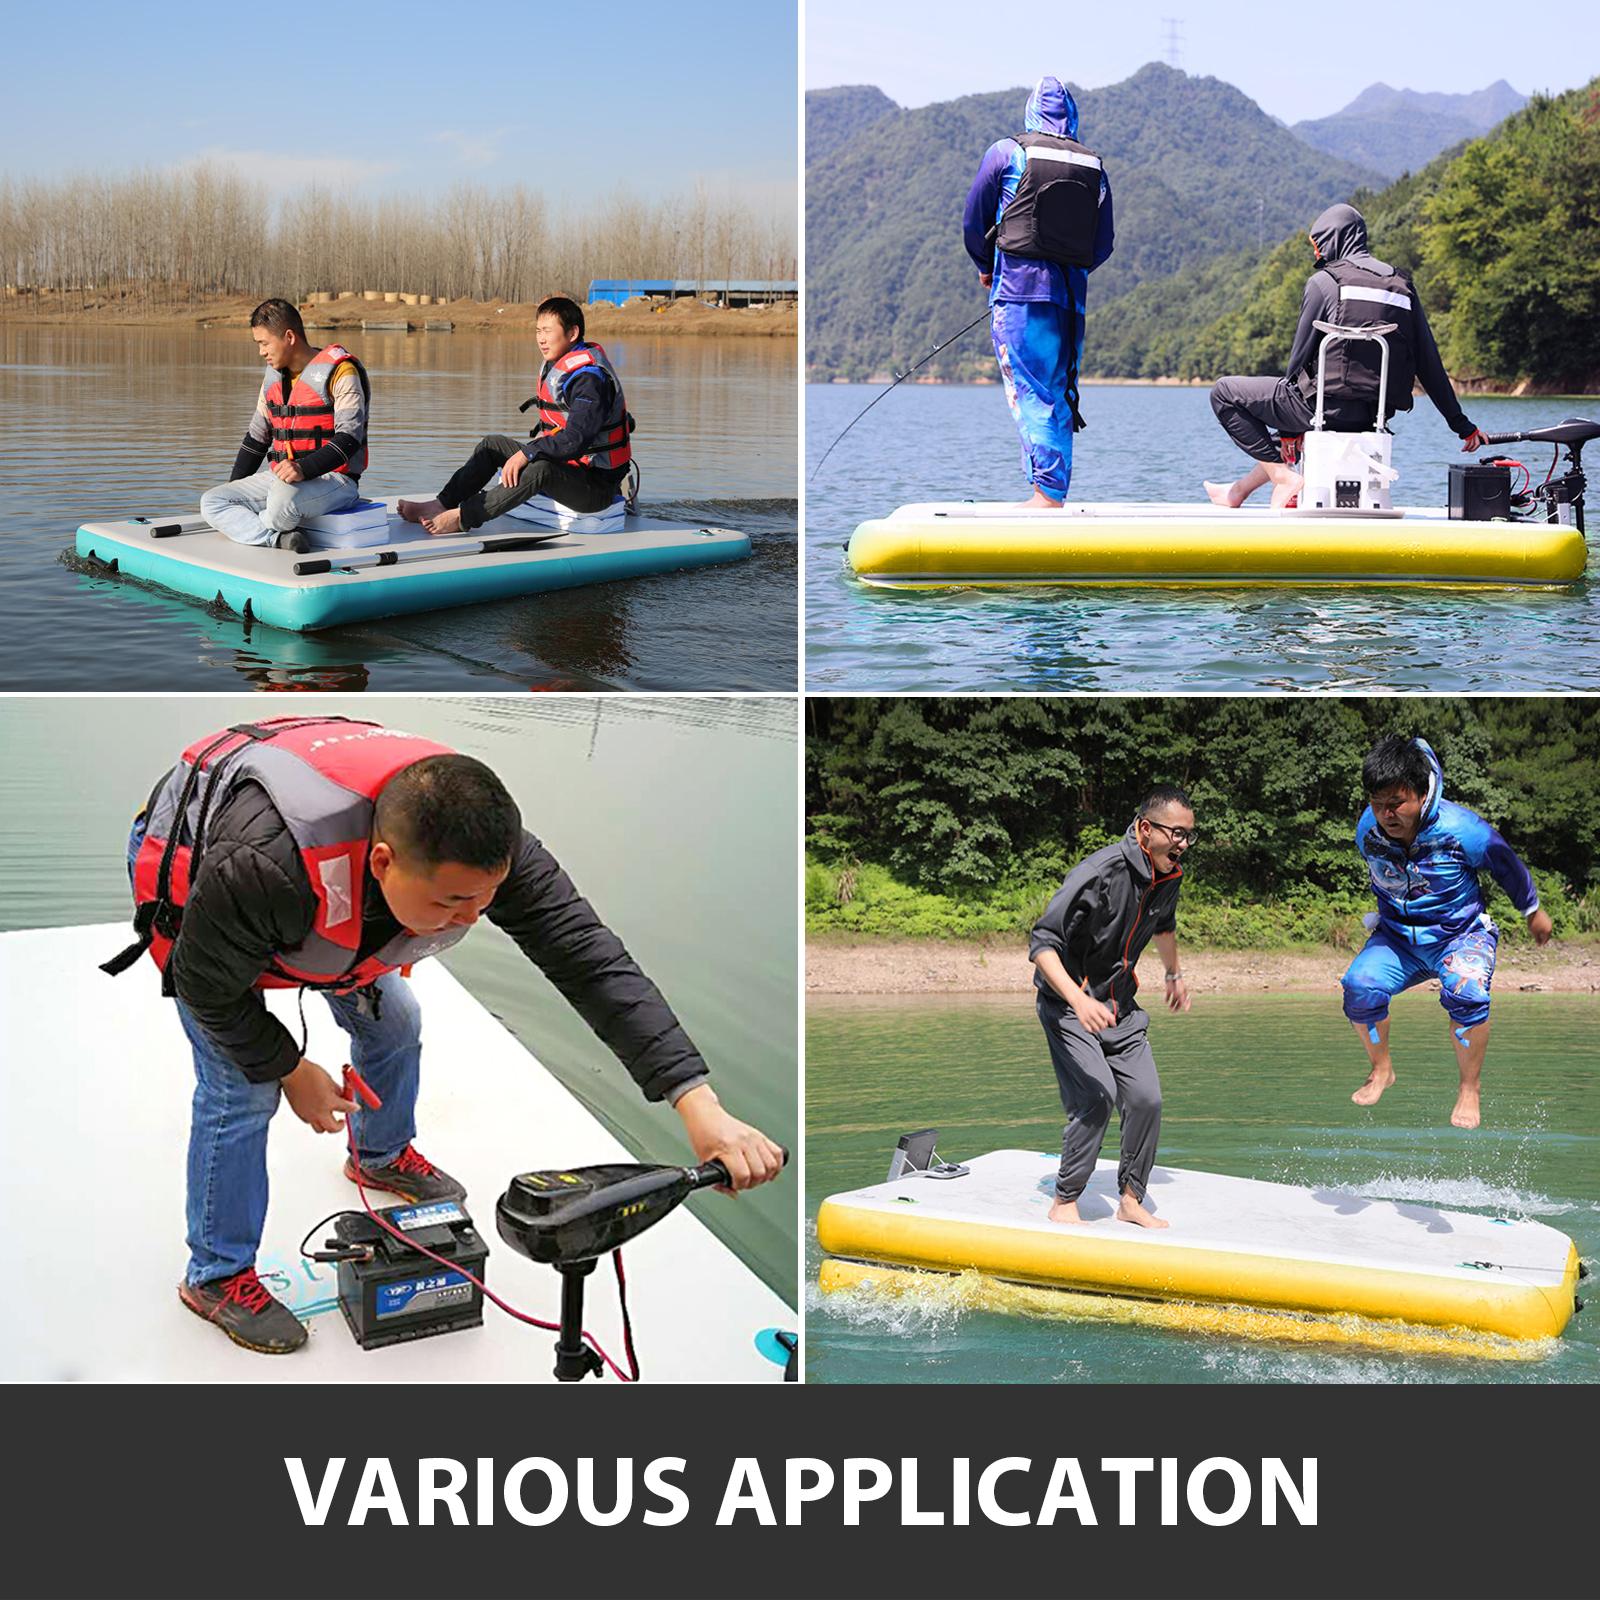 6/' x 5/' Inflatable Island Inflatable Floating Mesa Dock Swim Deck Platform